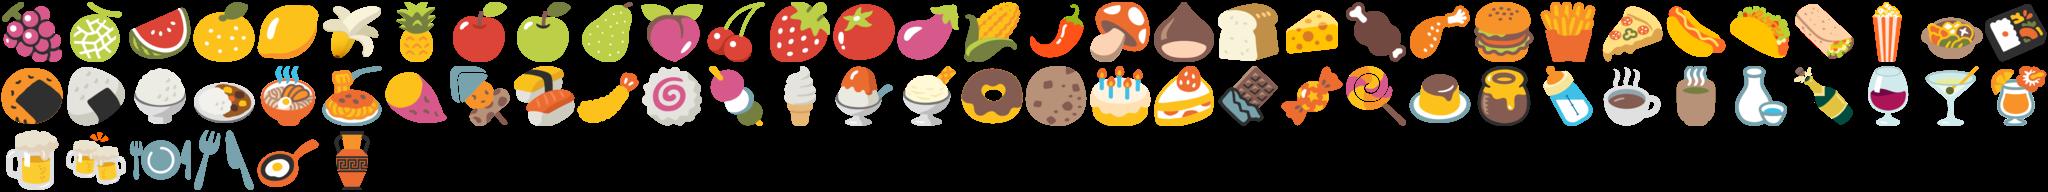 briar-android/assets/emoji_food_drink.png